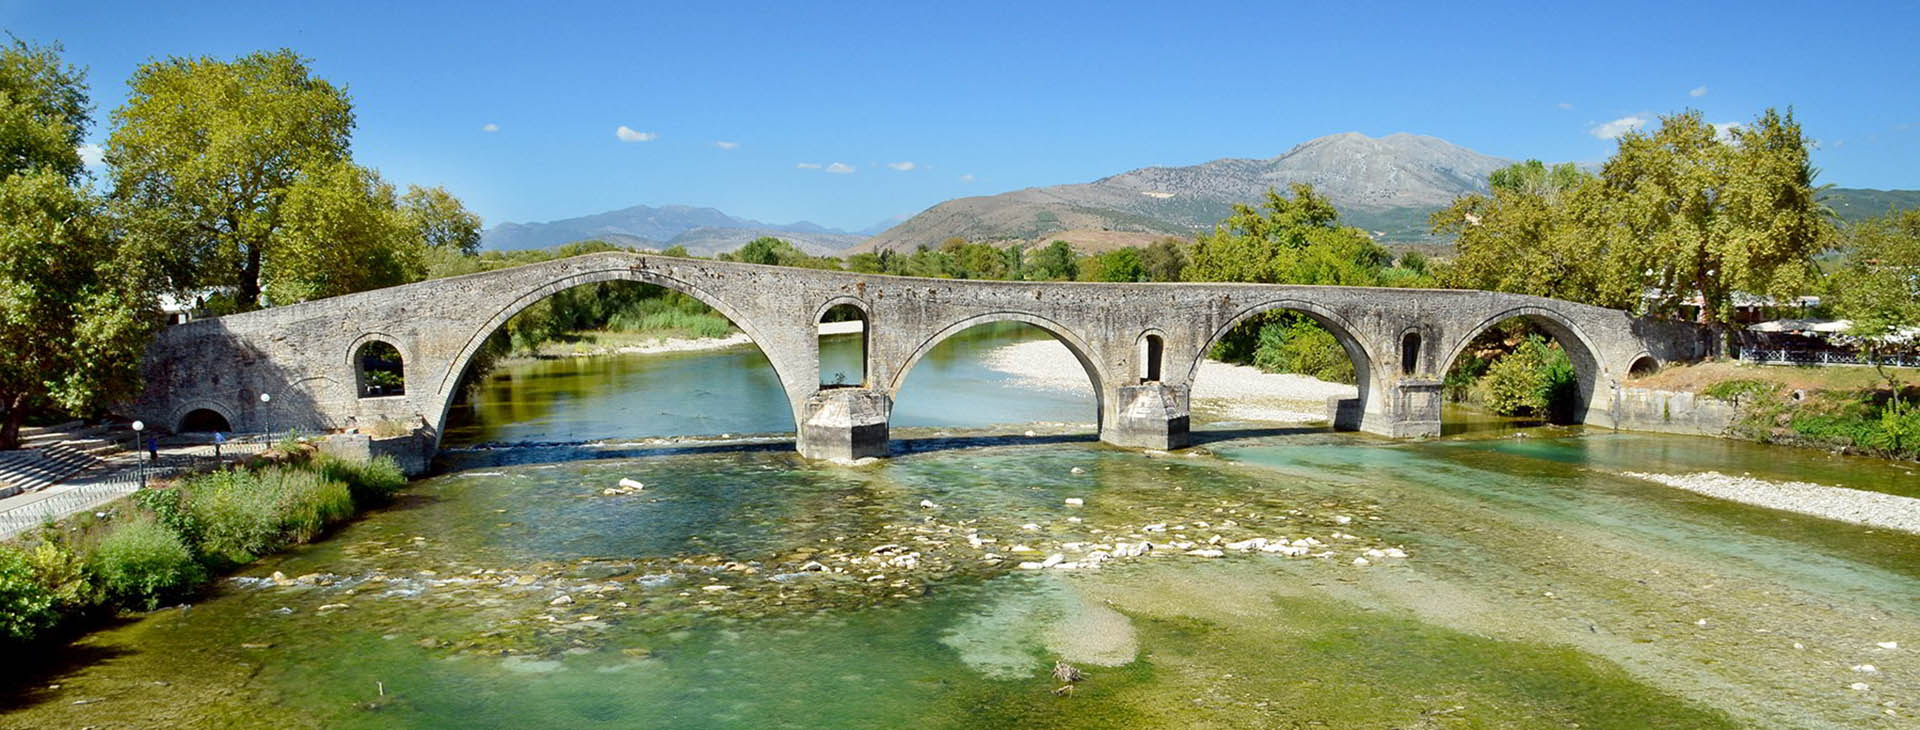 Historical bridge of Arta